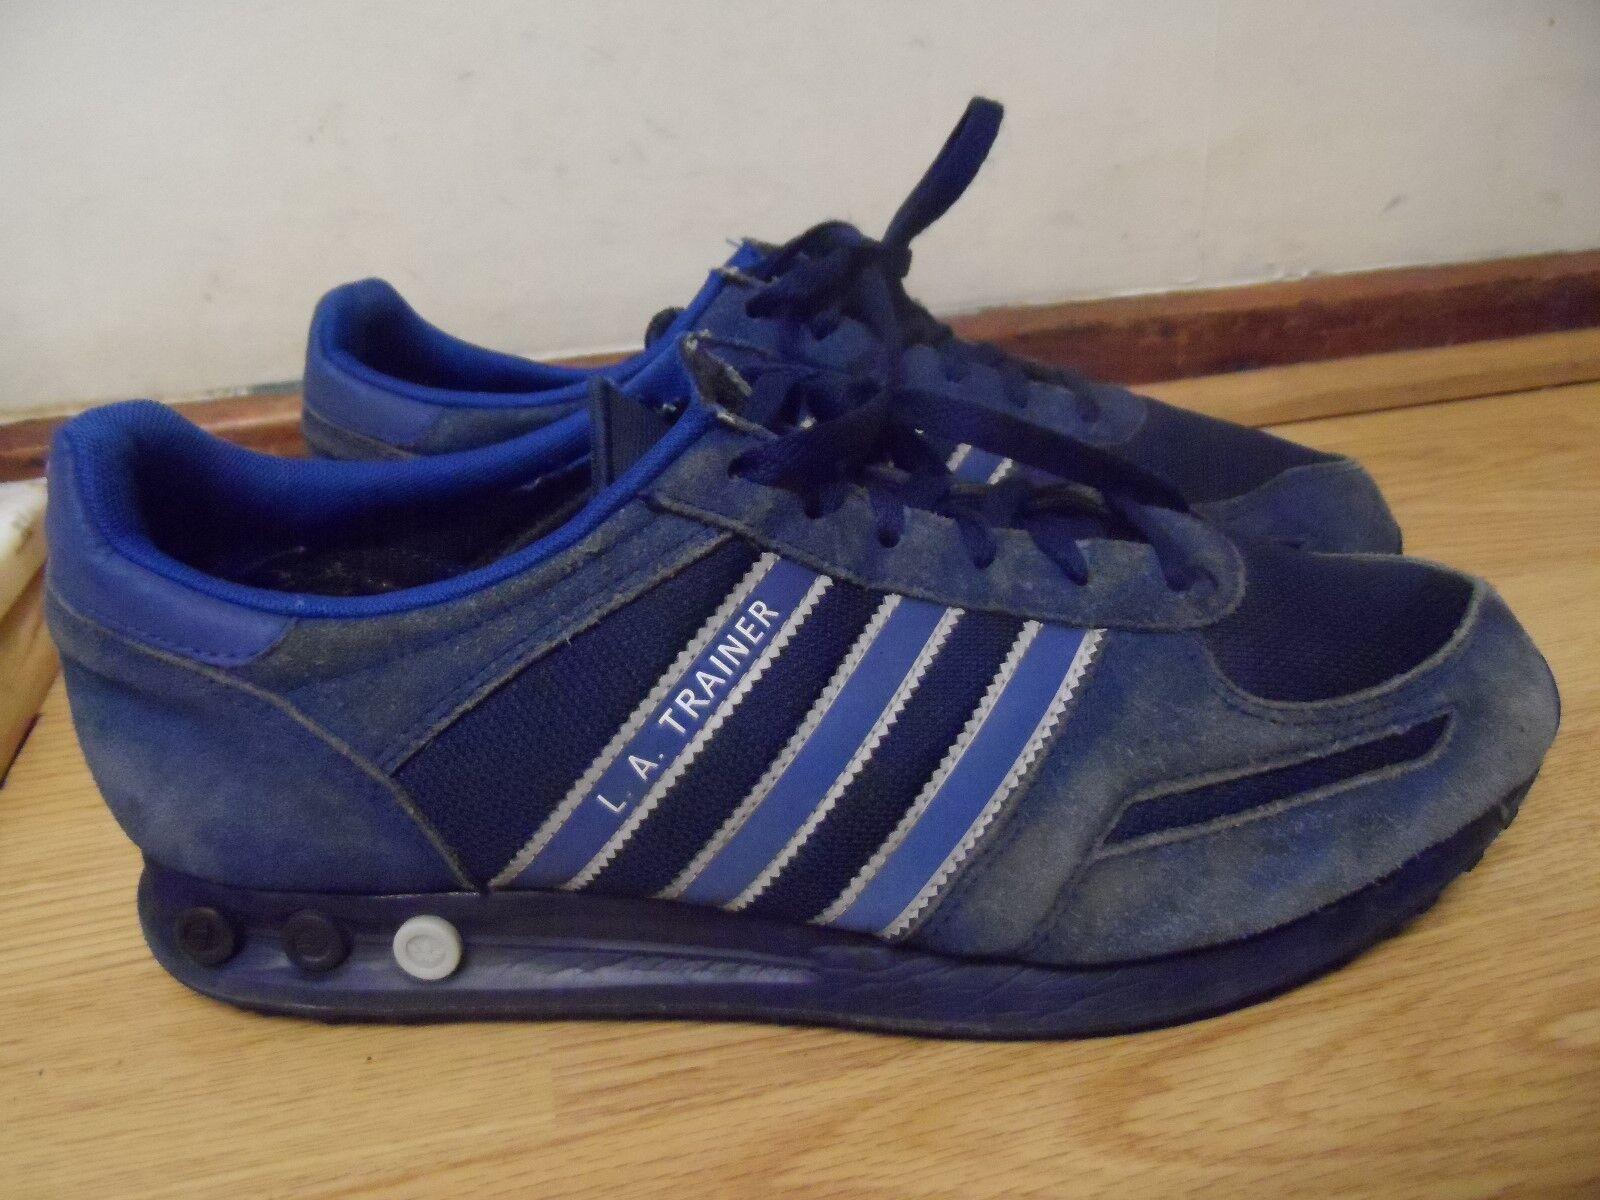 adidas la mens trainers size / eu 44 made in indonesia Cheap women's shoes women's shoes